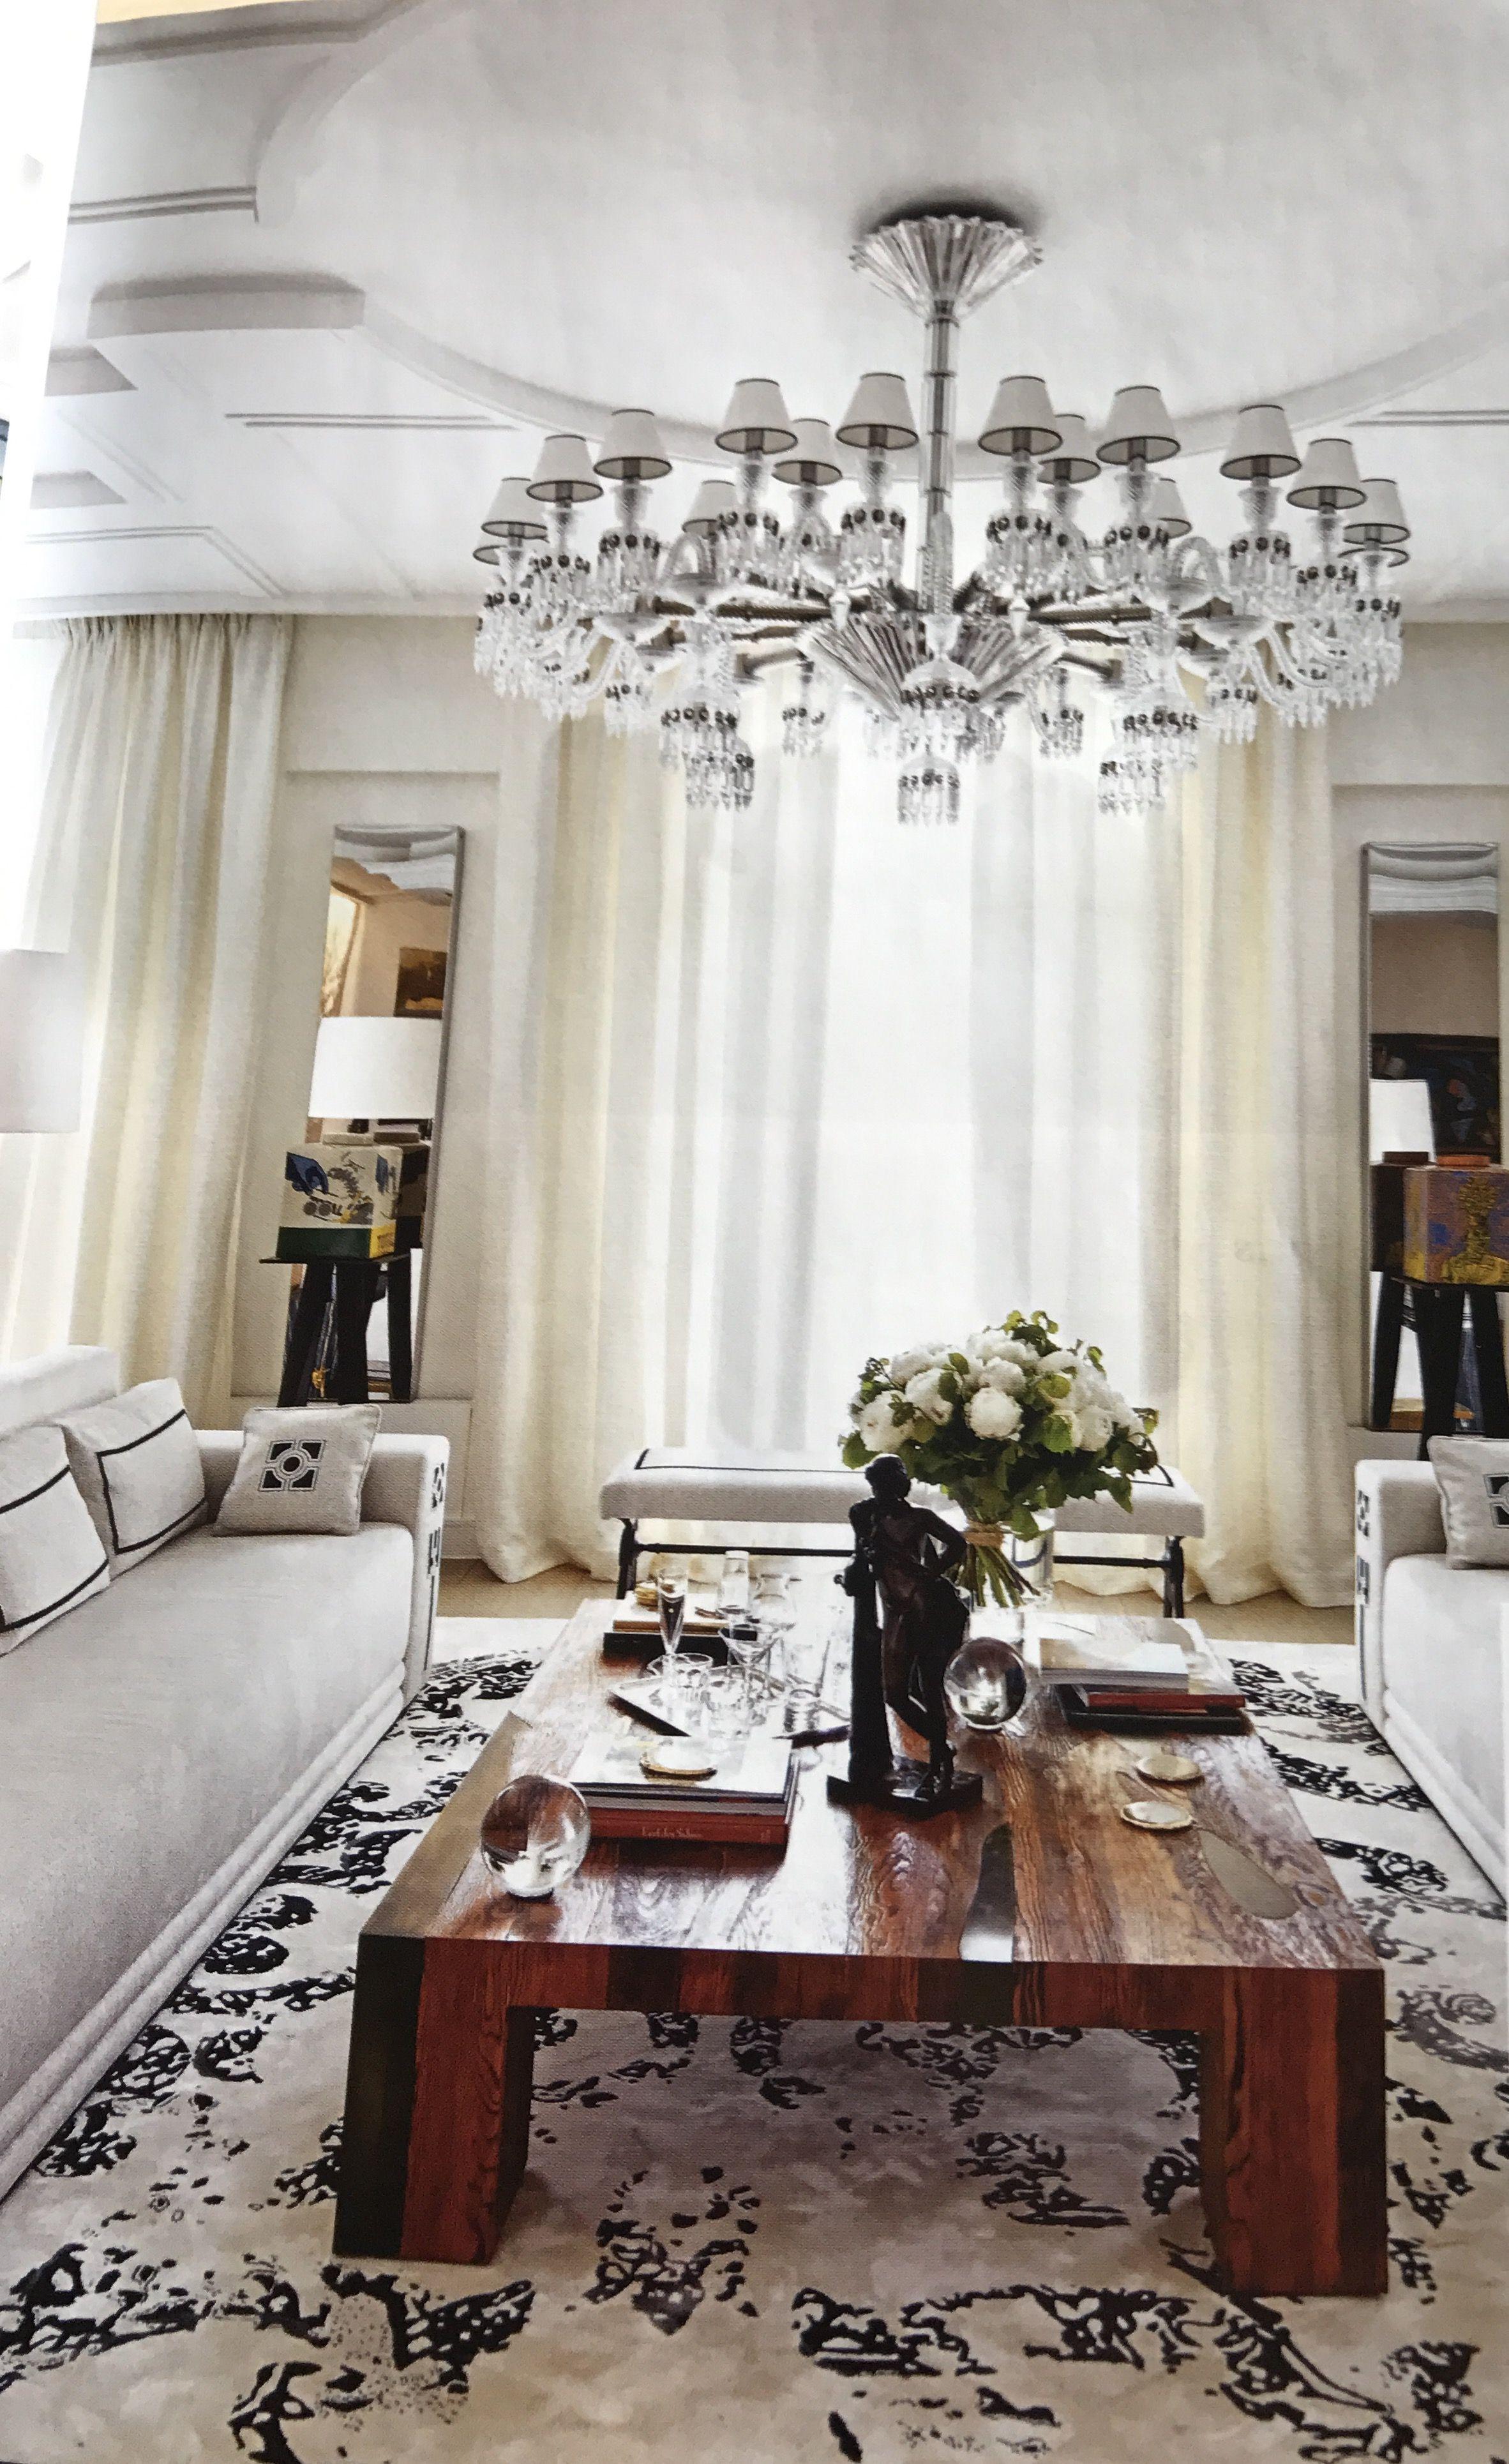 Pin by kriss aston on luxury interior pinterest luxury and interiors